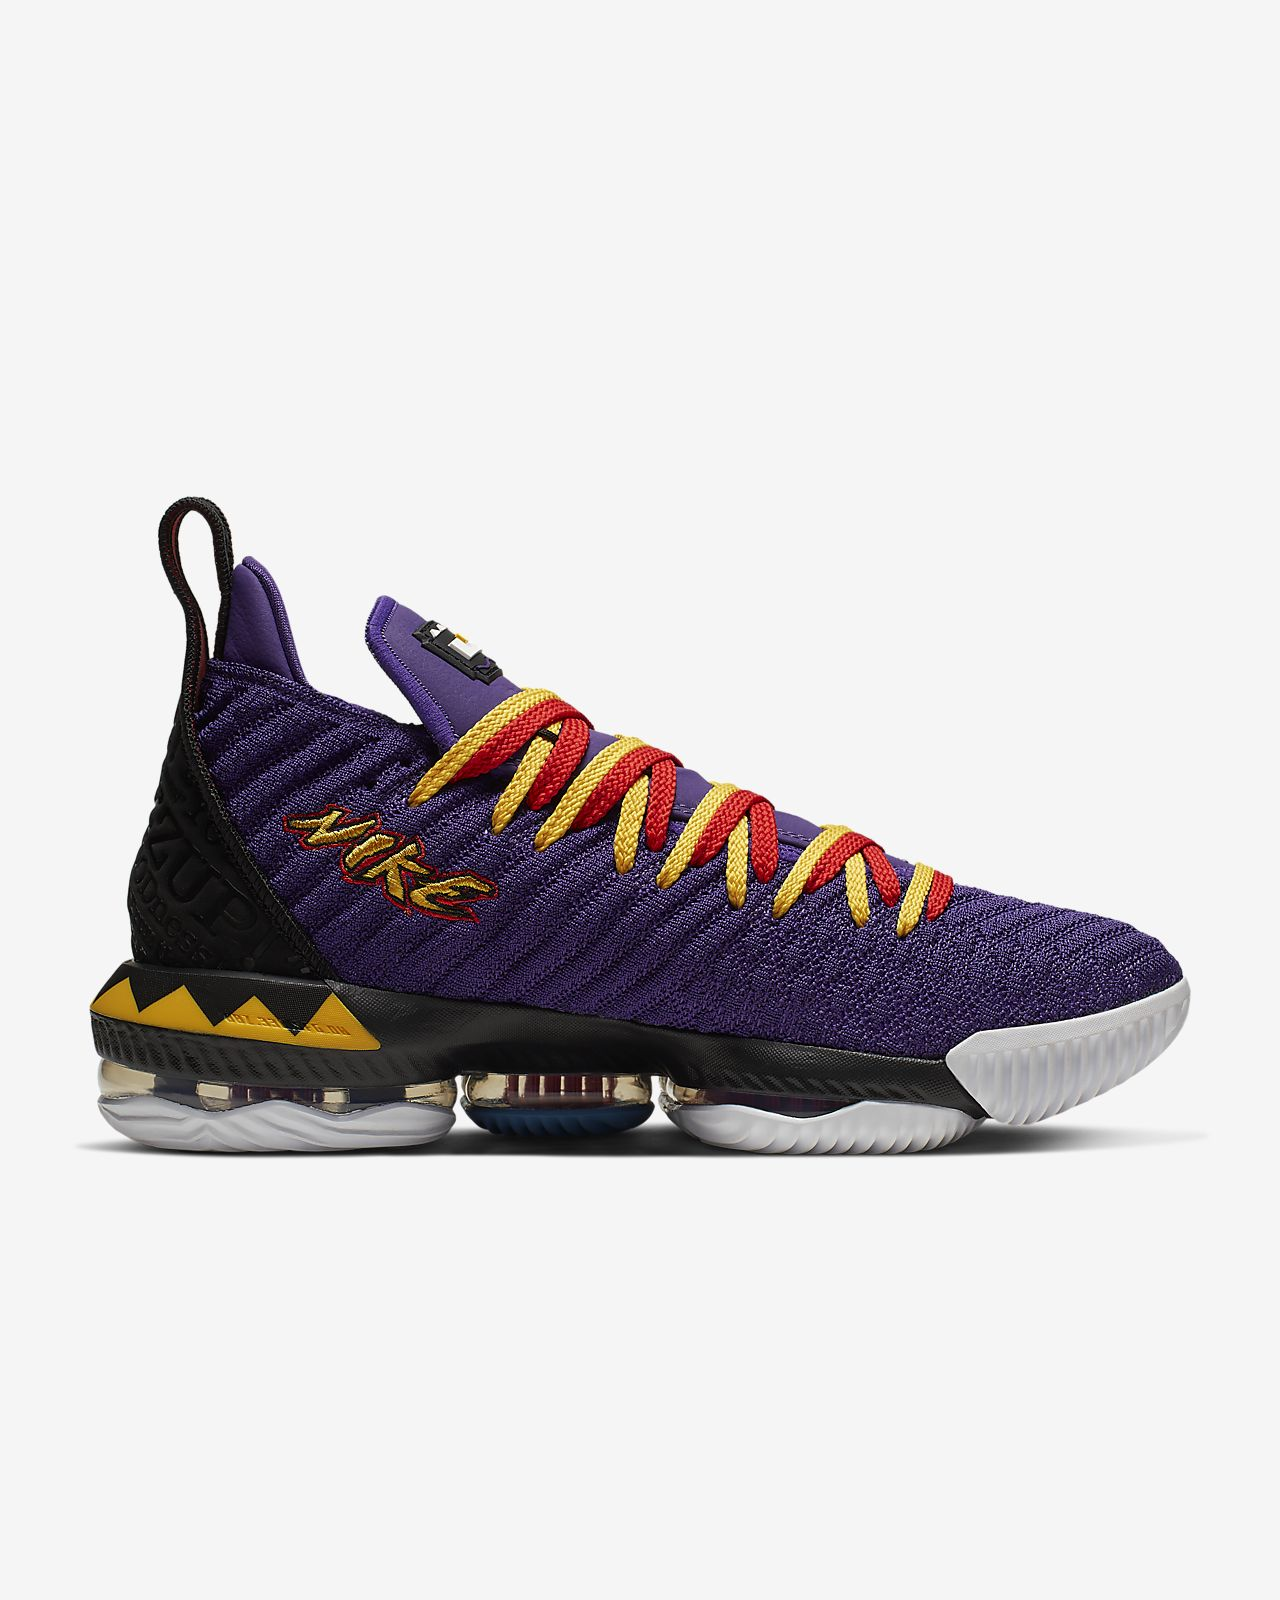 d5556a4464671 Low Resolution LeBron 16 Basketball Shoe LeBron 16 Basketball Shoe